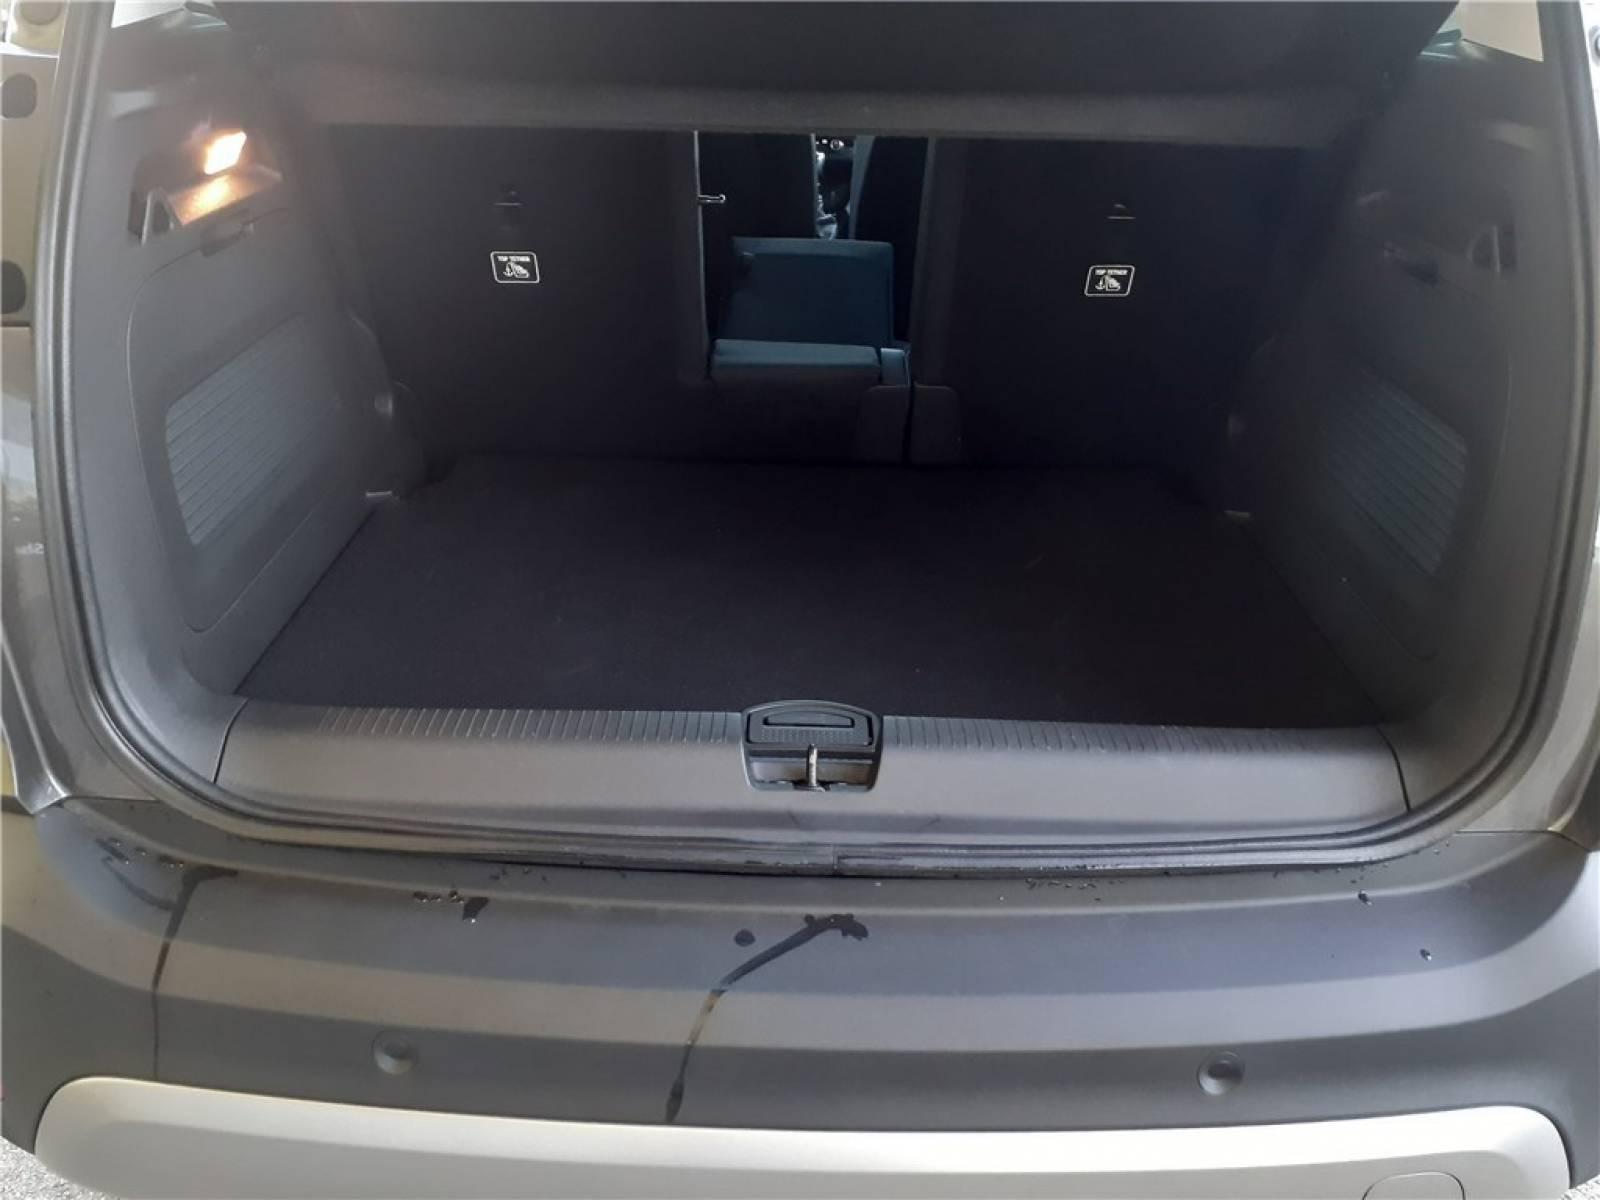 OPEL Crossland X 1.2 Turbo 130 ch - véhicule d'occasion - Groupe Guillet - Opel Magicauto - Chalon-sur-Saône - 71380 - Saint-Marcel - 20